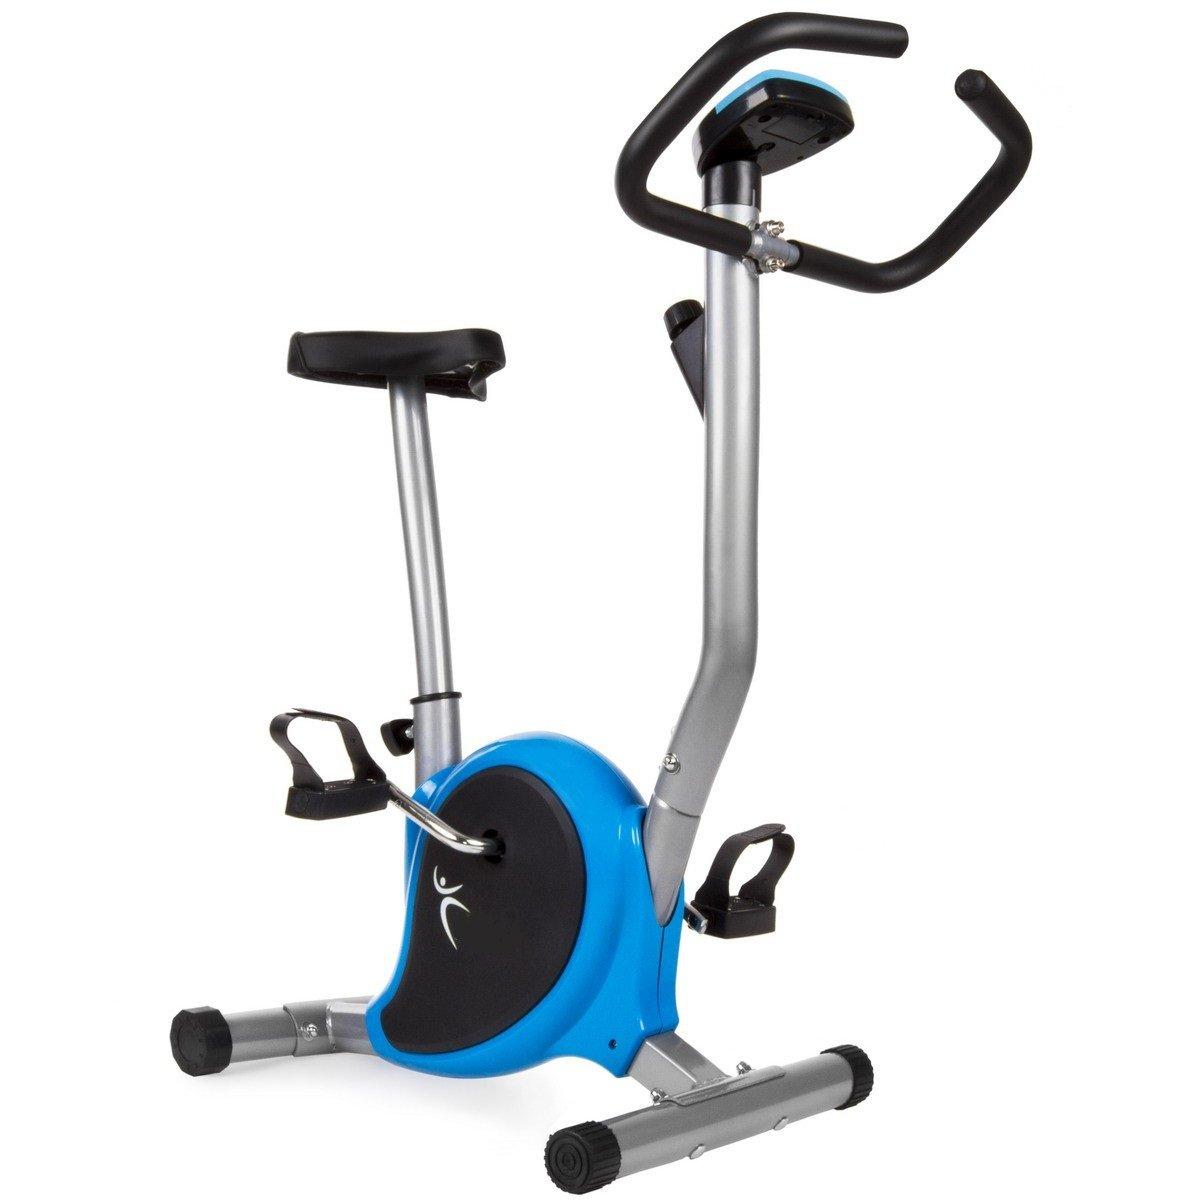 Bicicleta estatica regulable con pantalla LCD: Amazon.es: Deportes ...